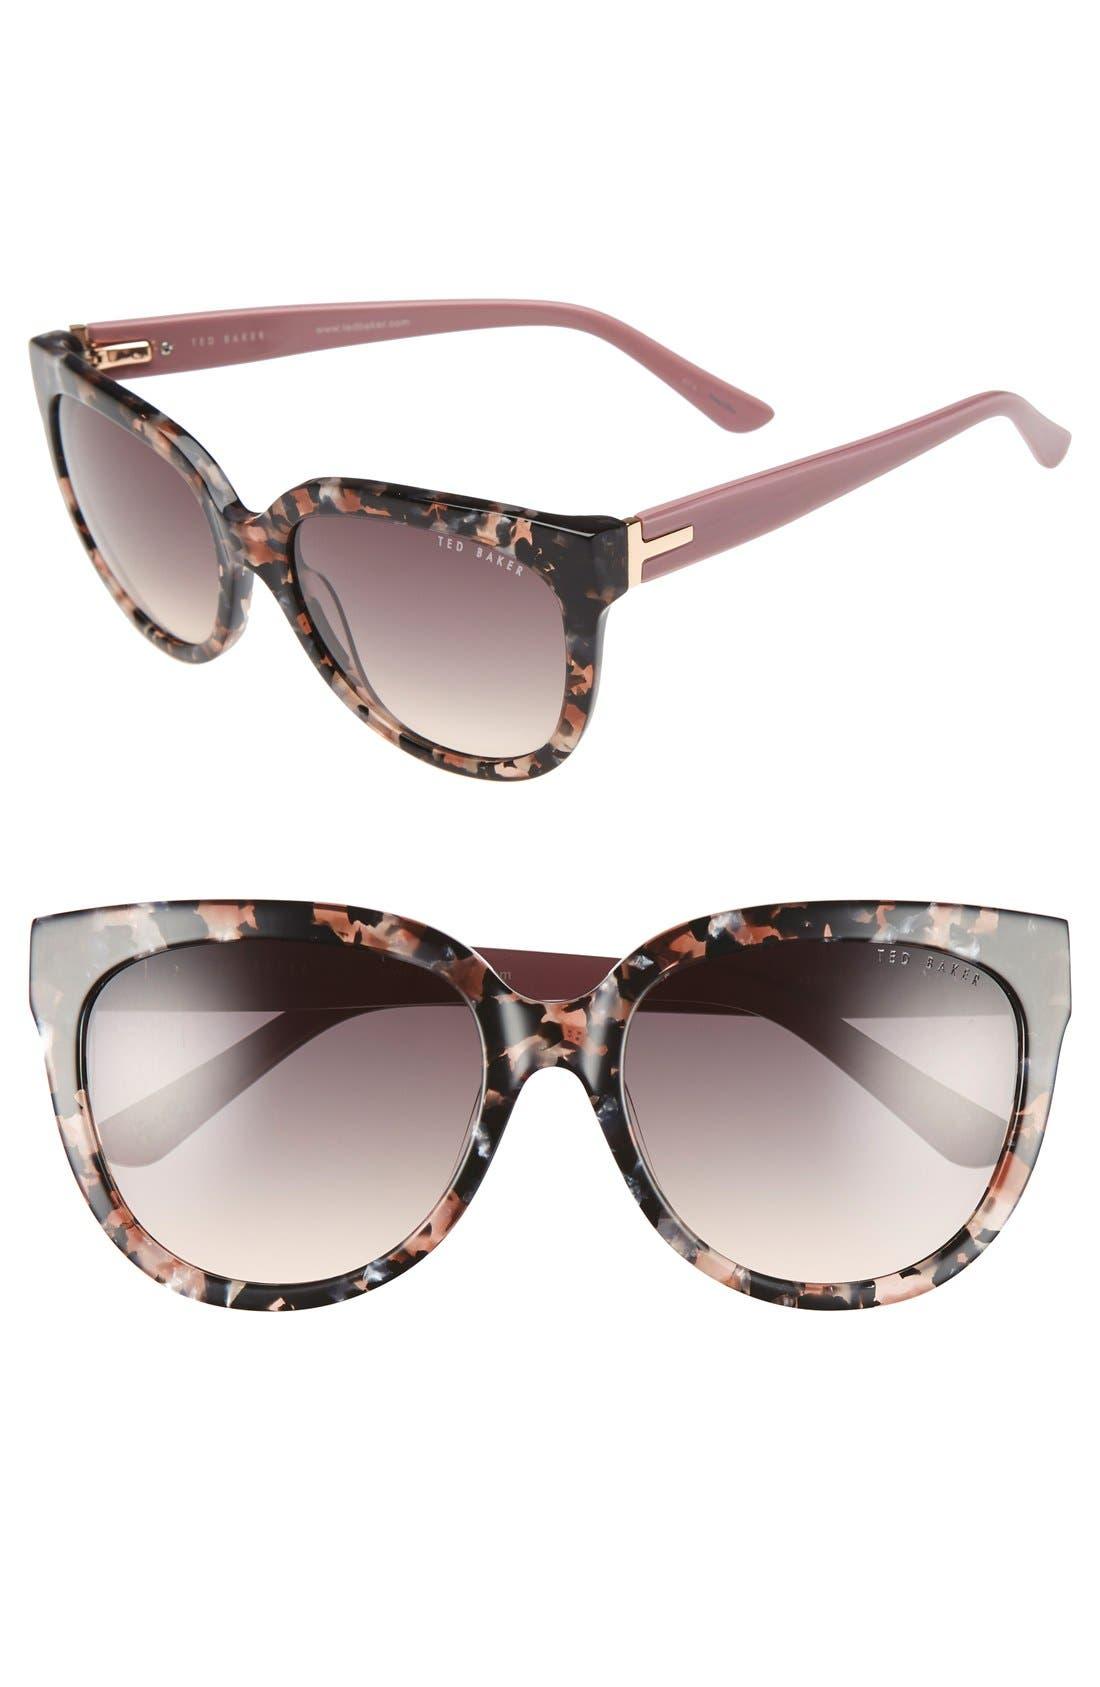 Main Image - Ted Baker London 55mm Cat Eye Sunglasses